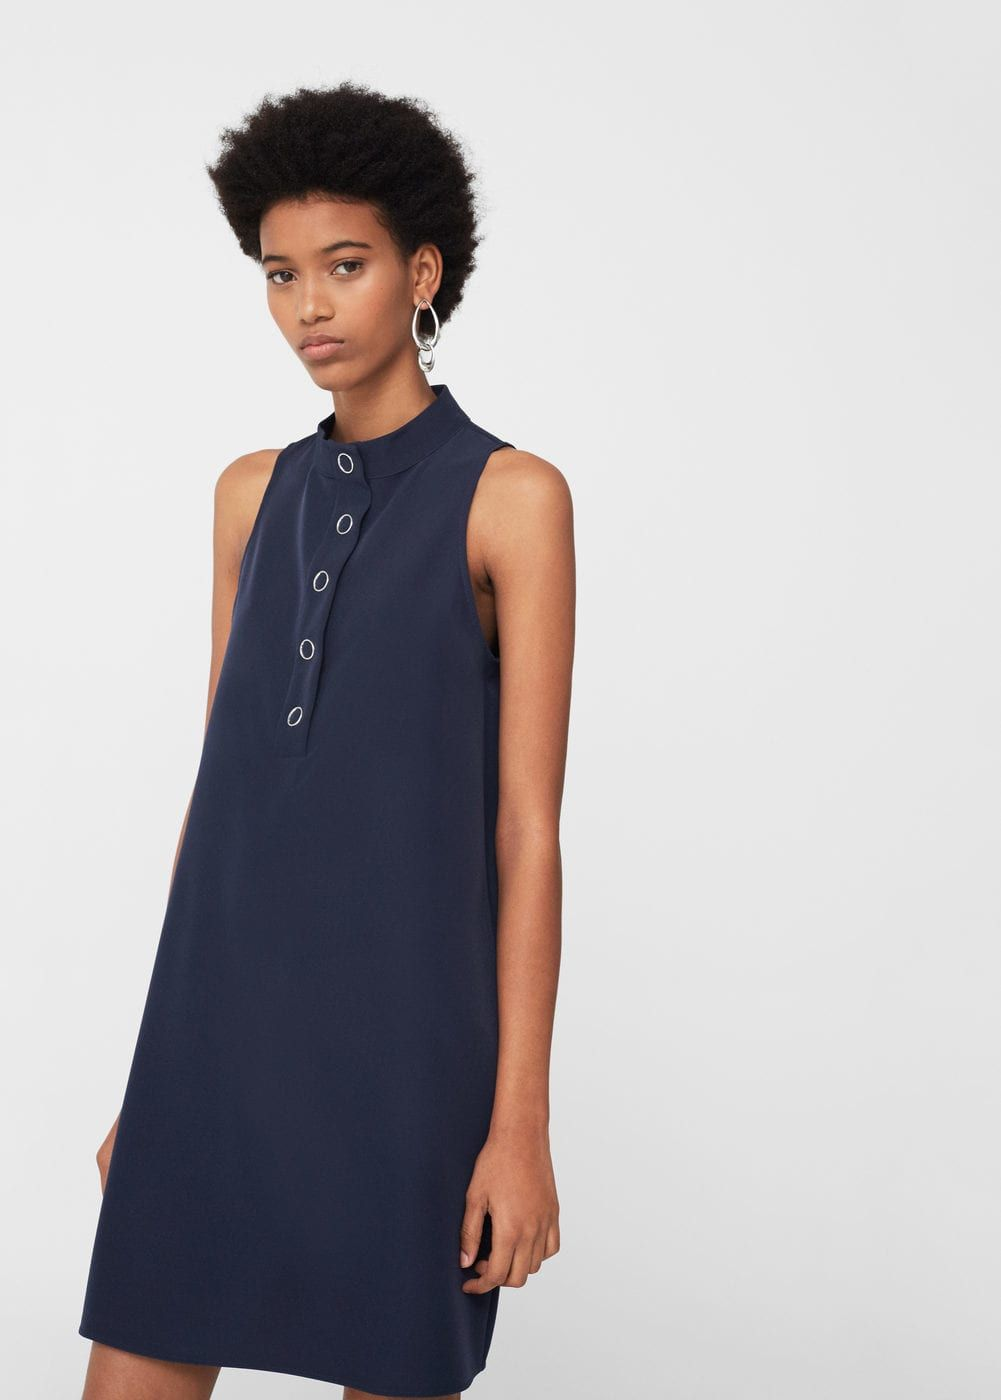 Robe à boutons - Femme   shopping   Pinterest 339aebdfaf9